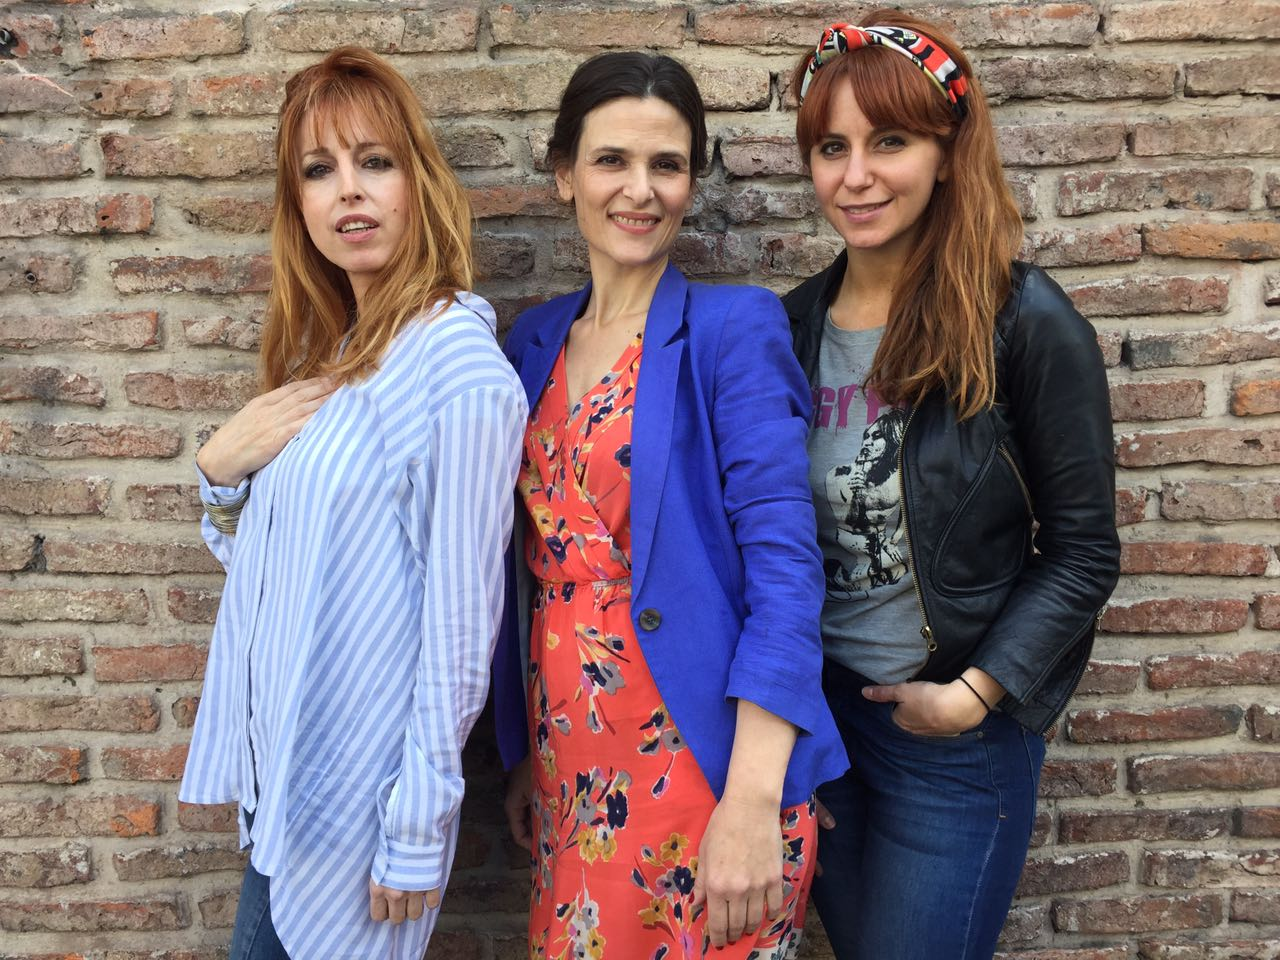 SER ELLAS: Ana Celentano, Anabel Cherubito y Julieta Cayetina